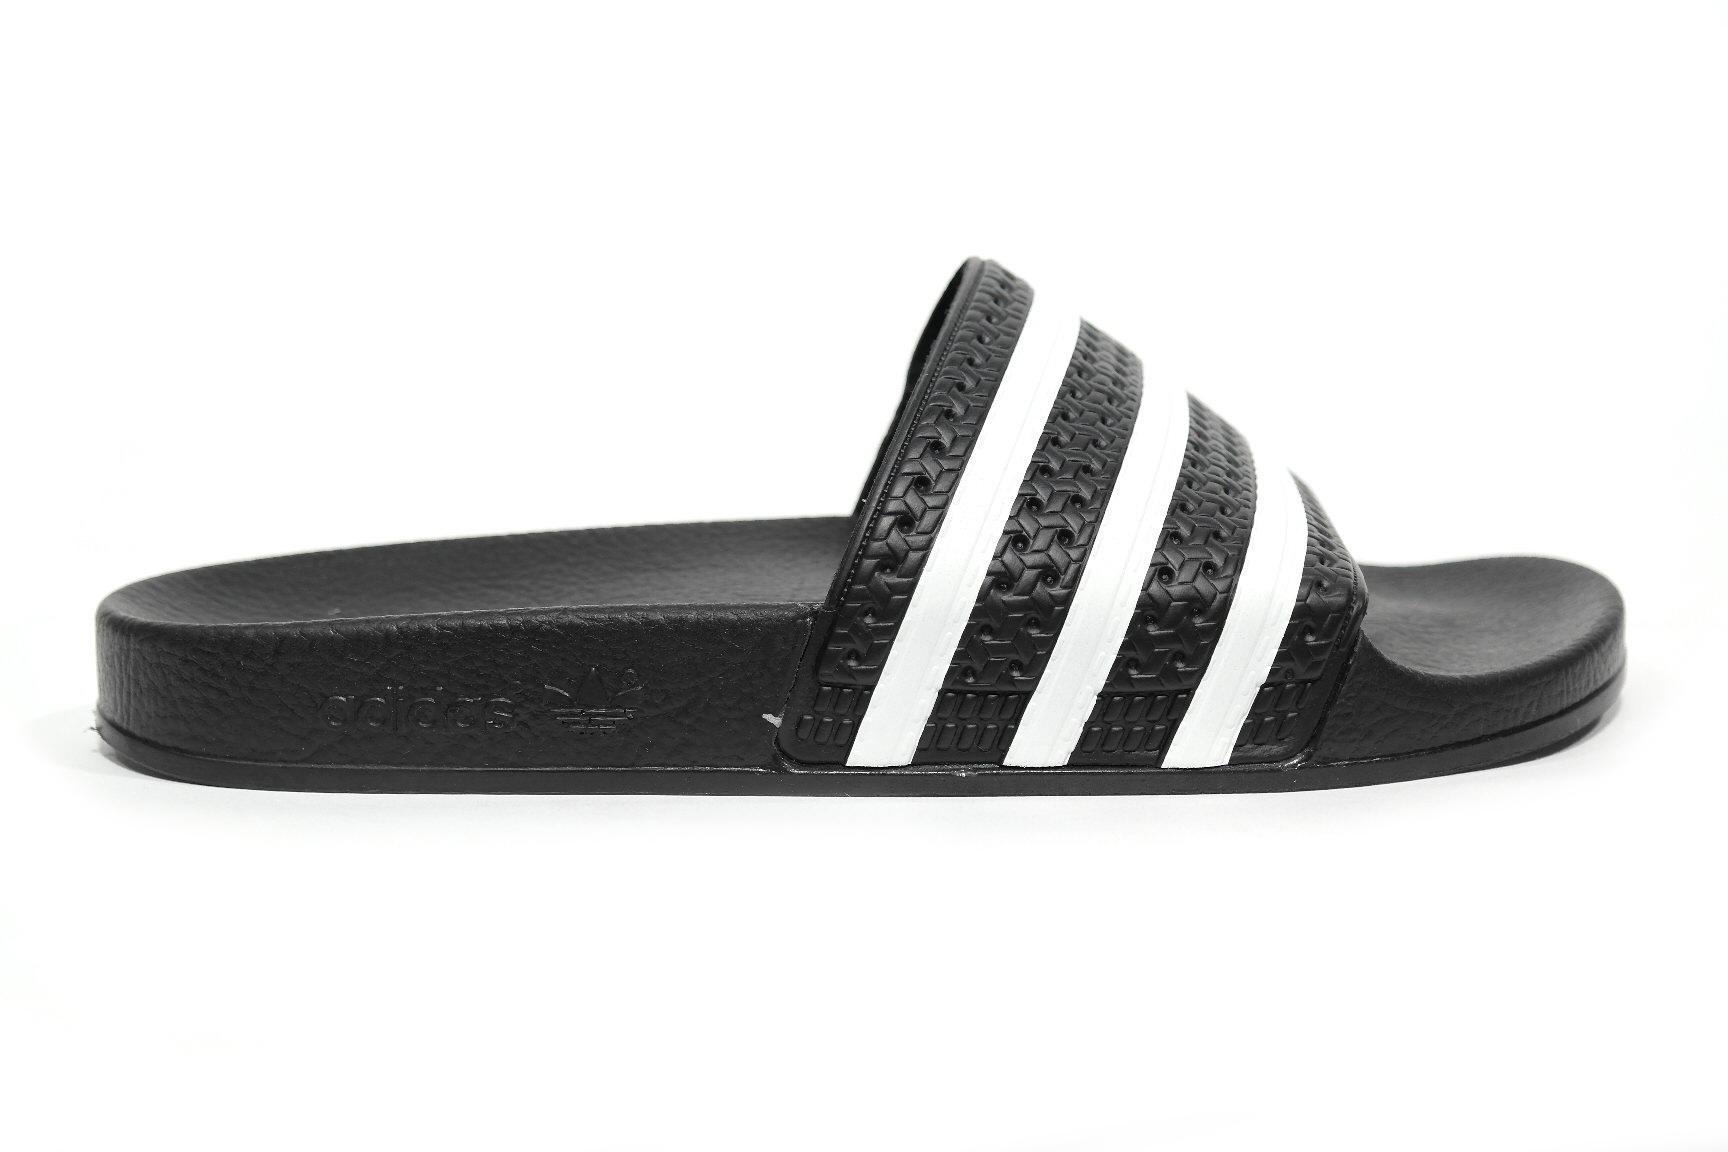 badslipper Adidas Adilette 280647 ADILETTE ZWART